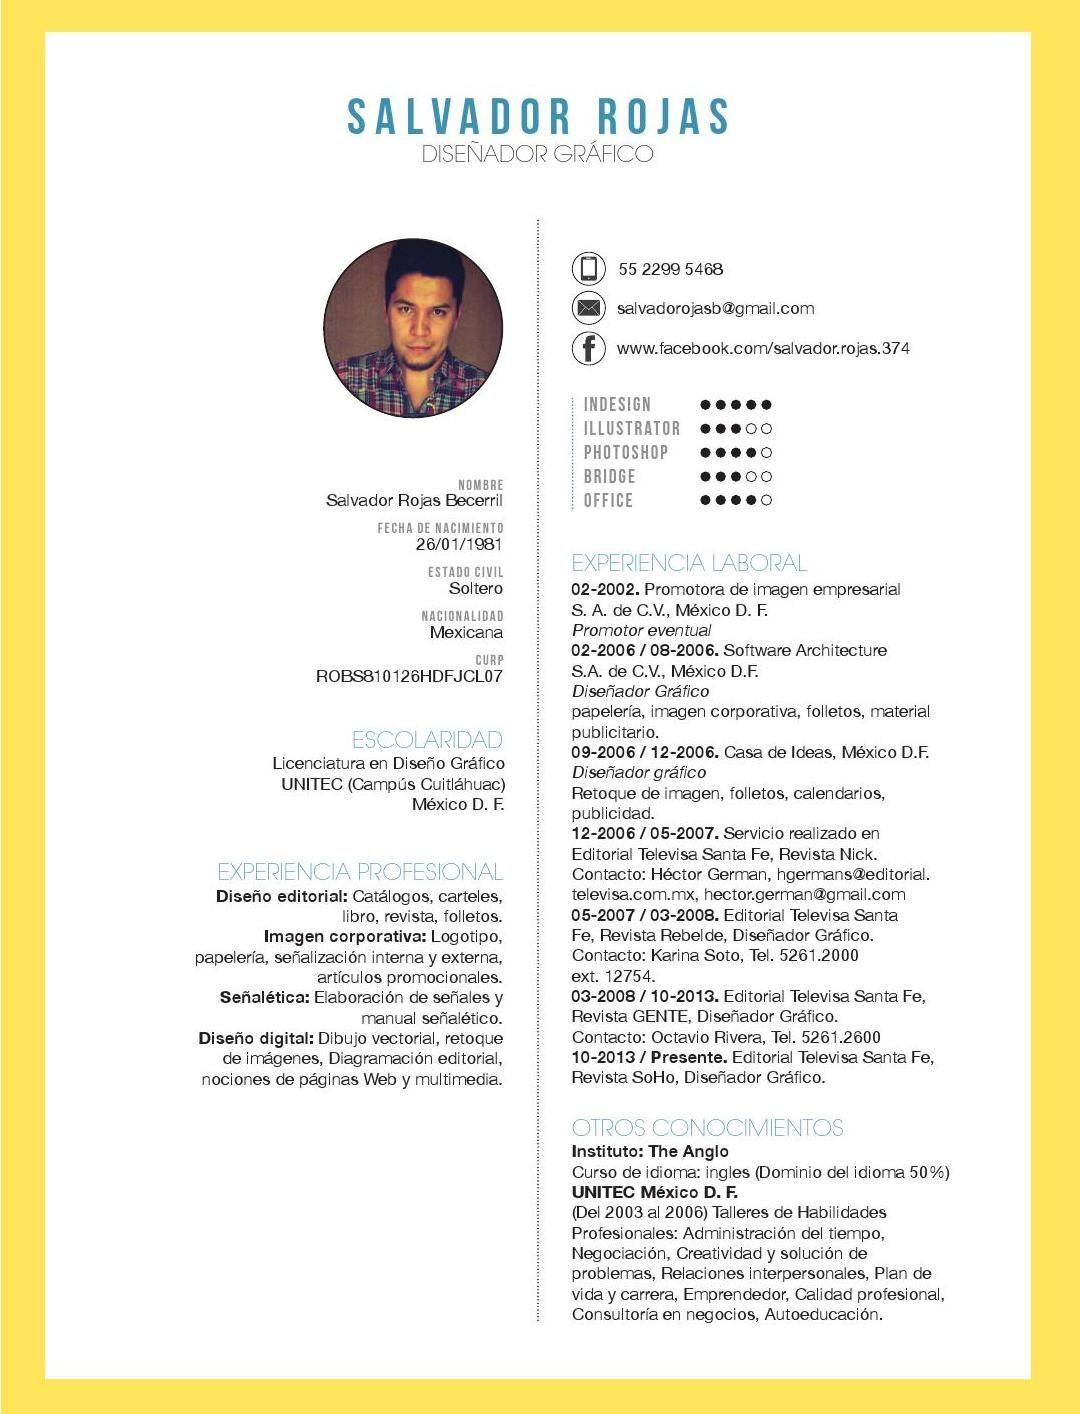 Cv salvador | Diseño | Pinterest | Currículum